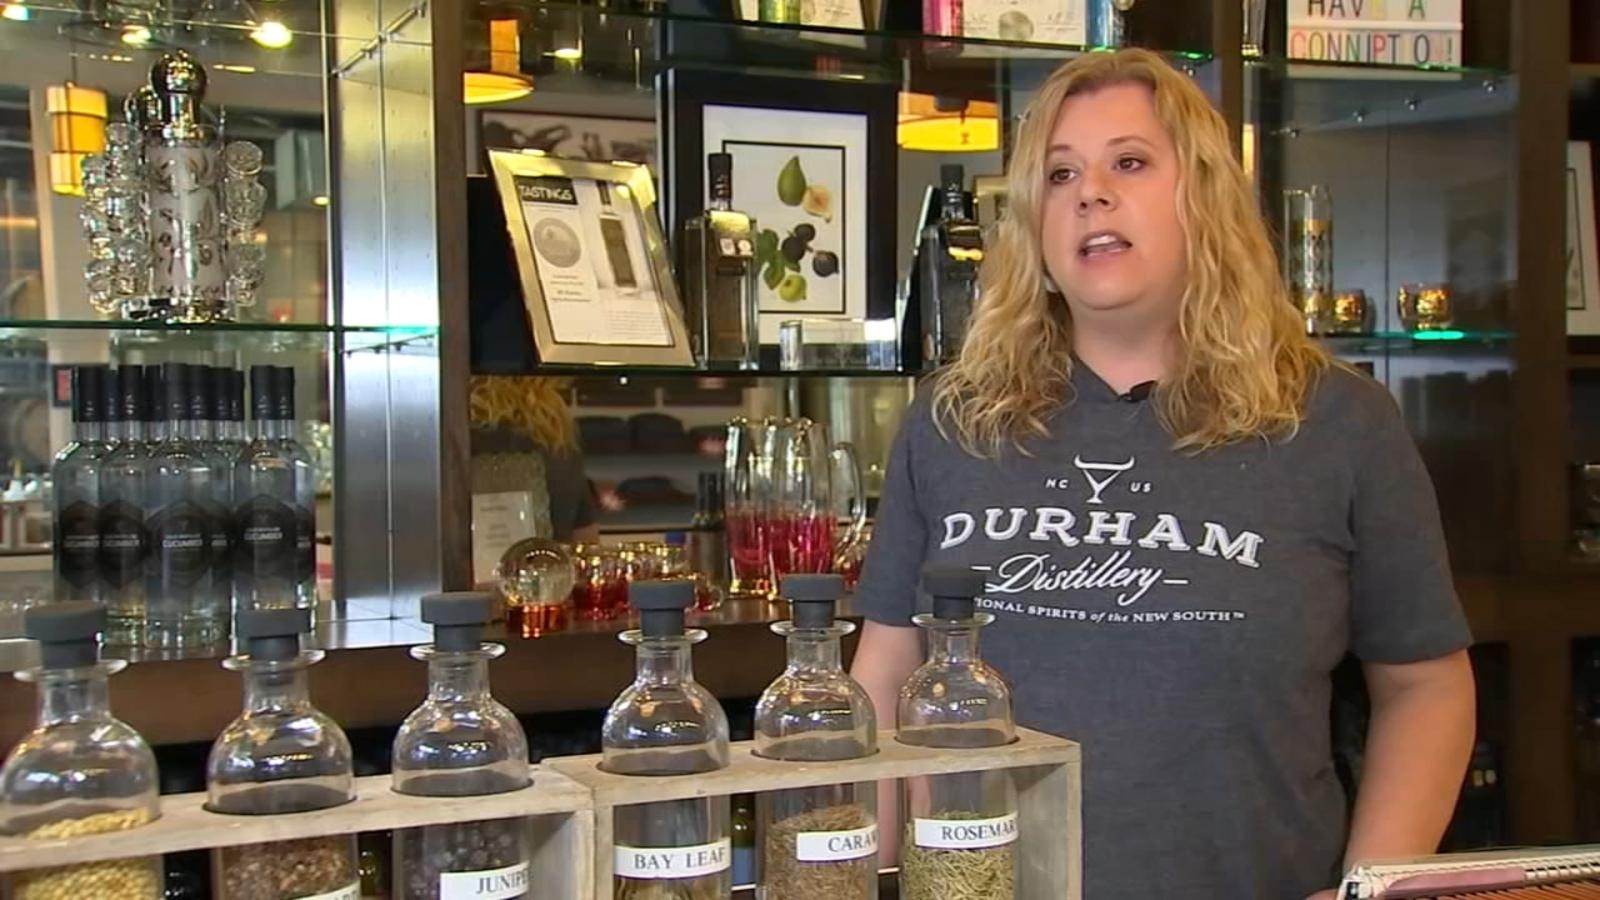 Durham Distillery Using Alcohol To Make Free Hand Sanitizer For Local Restaurants During Coronavirus Pandemic photo